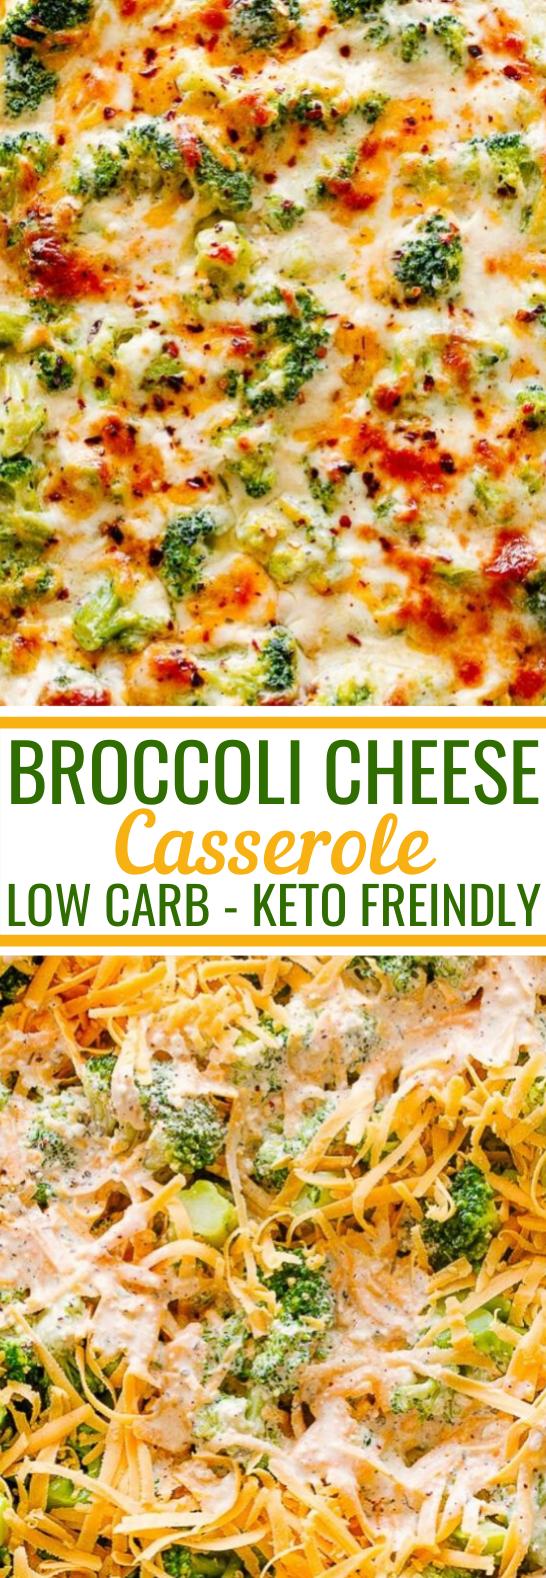 Broccoli Cheese Casserole #healthy #glutenfree #casserole #lowcarb #chicken